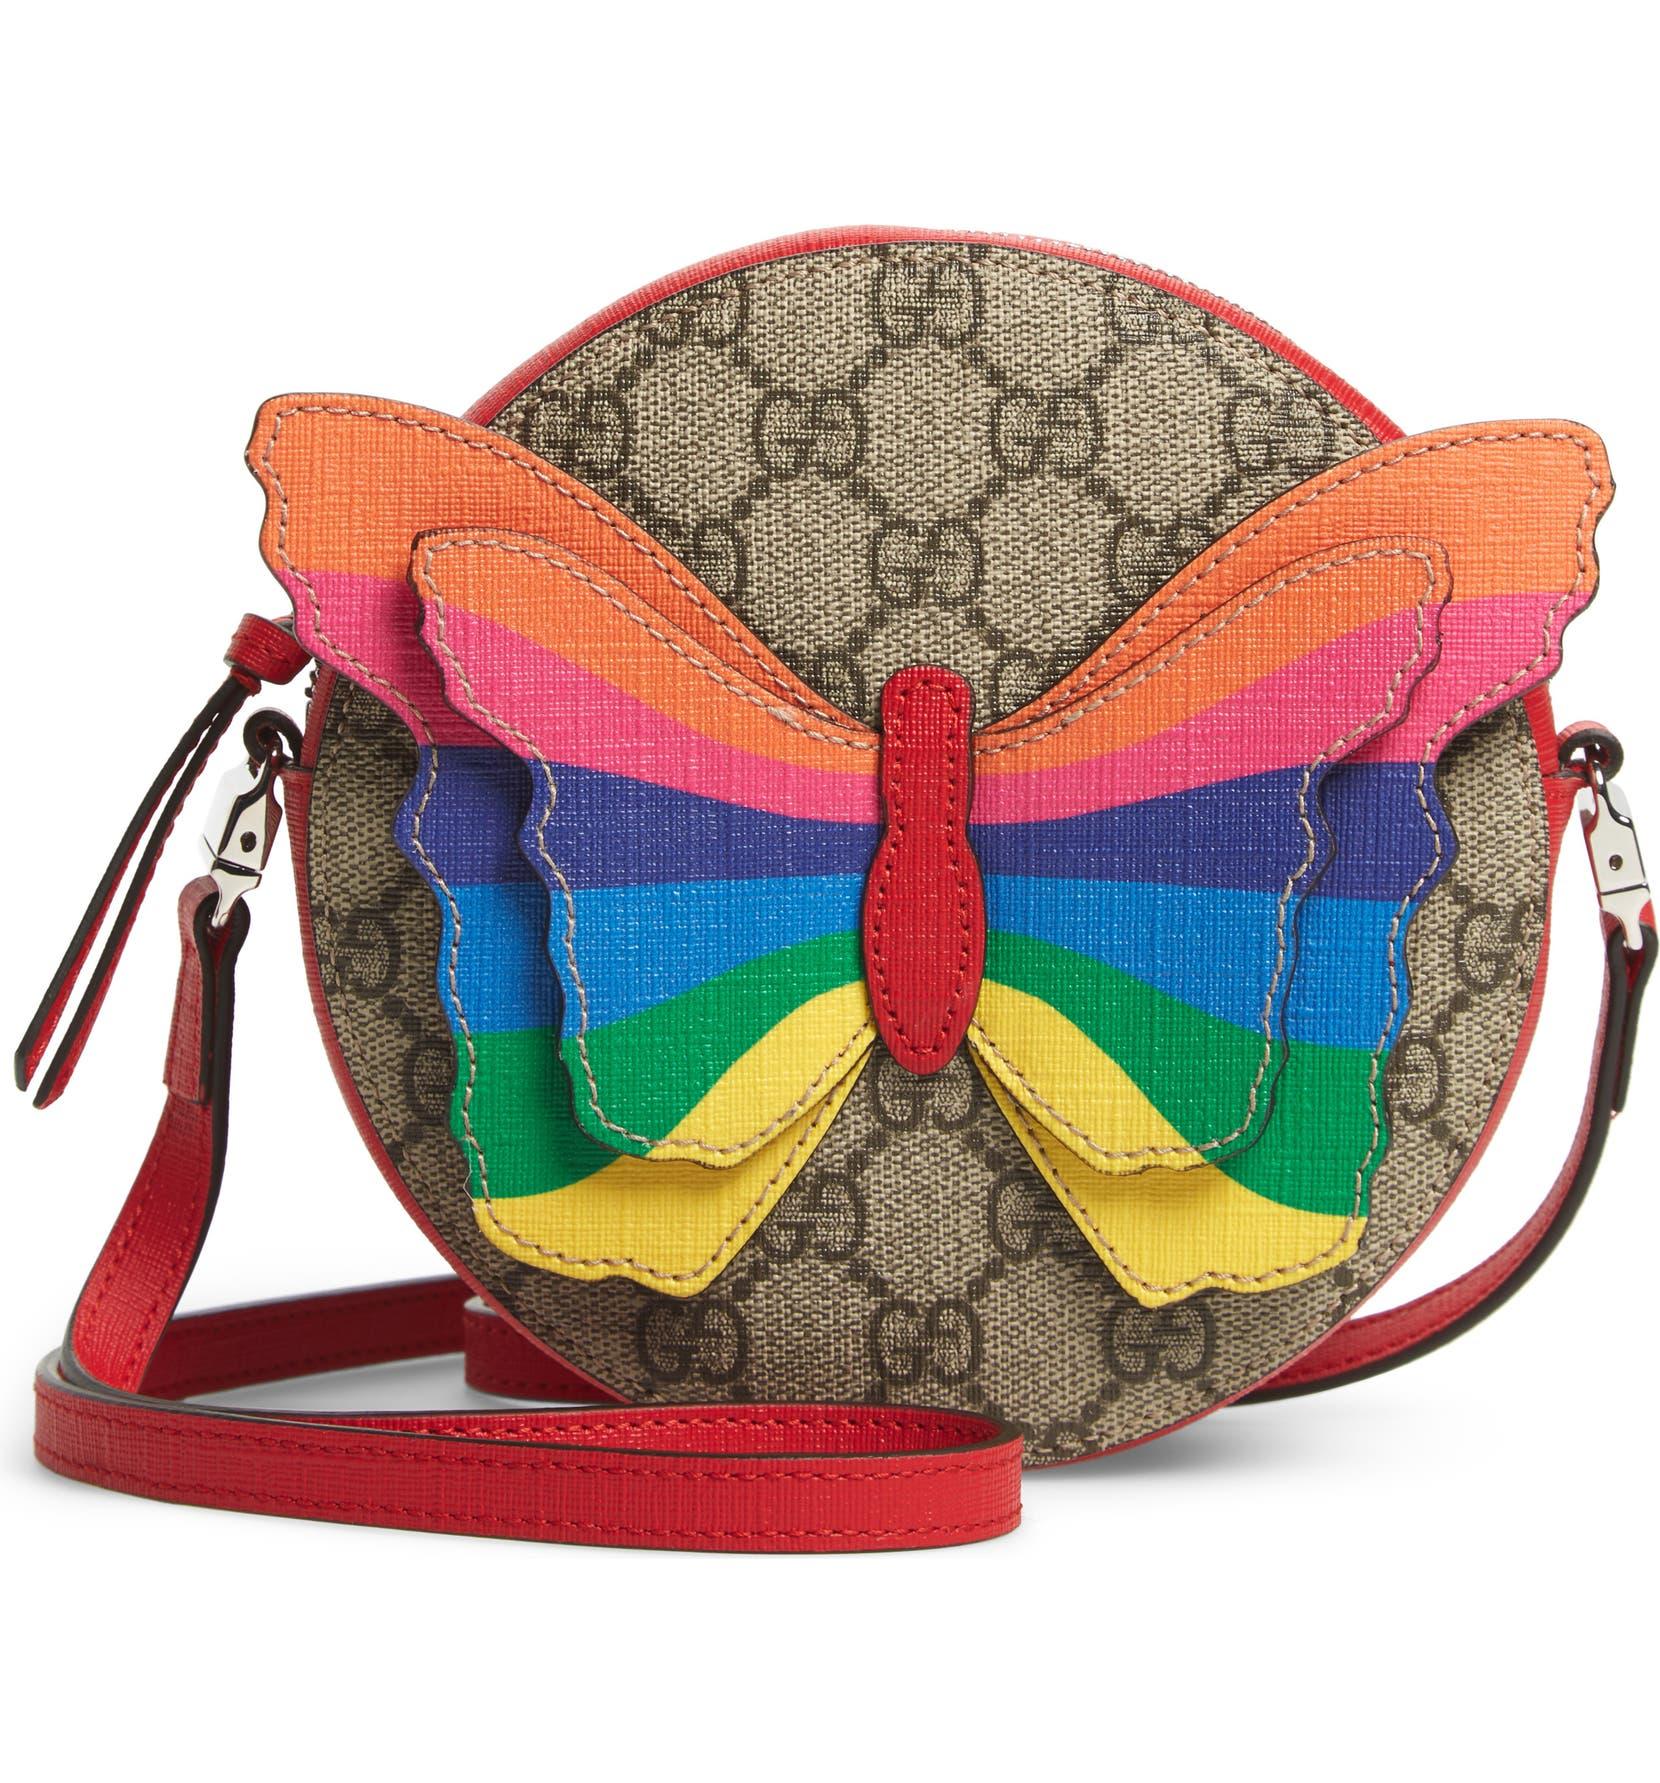 Gucci GG Supreme Rainbow Butterfly Crossbody Bag (Kids)  9e5f09e6db0fb